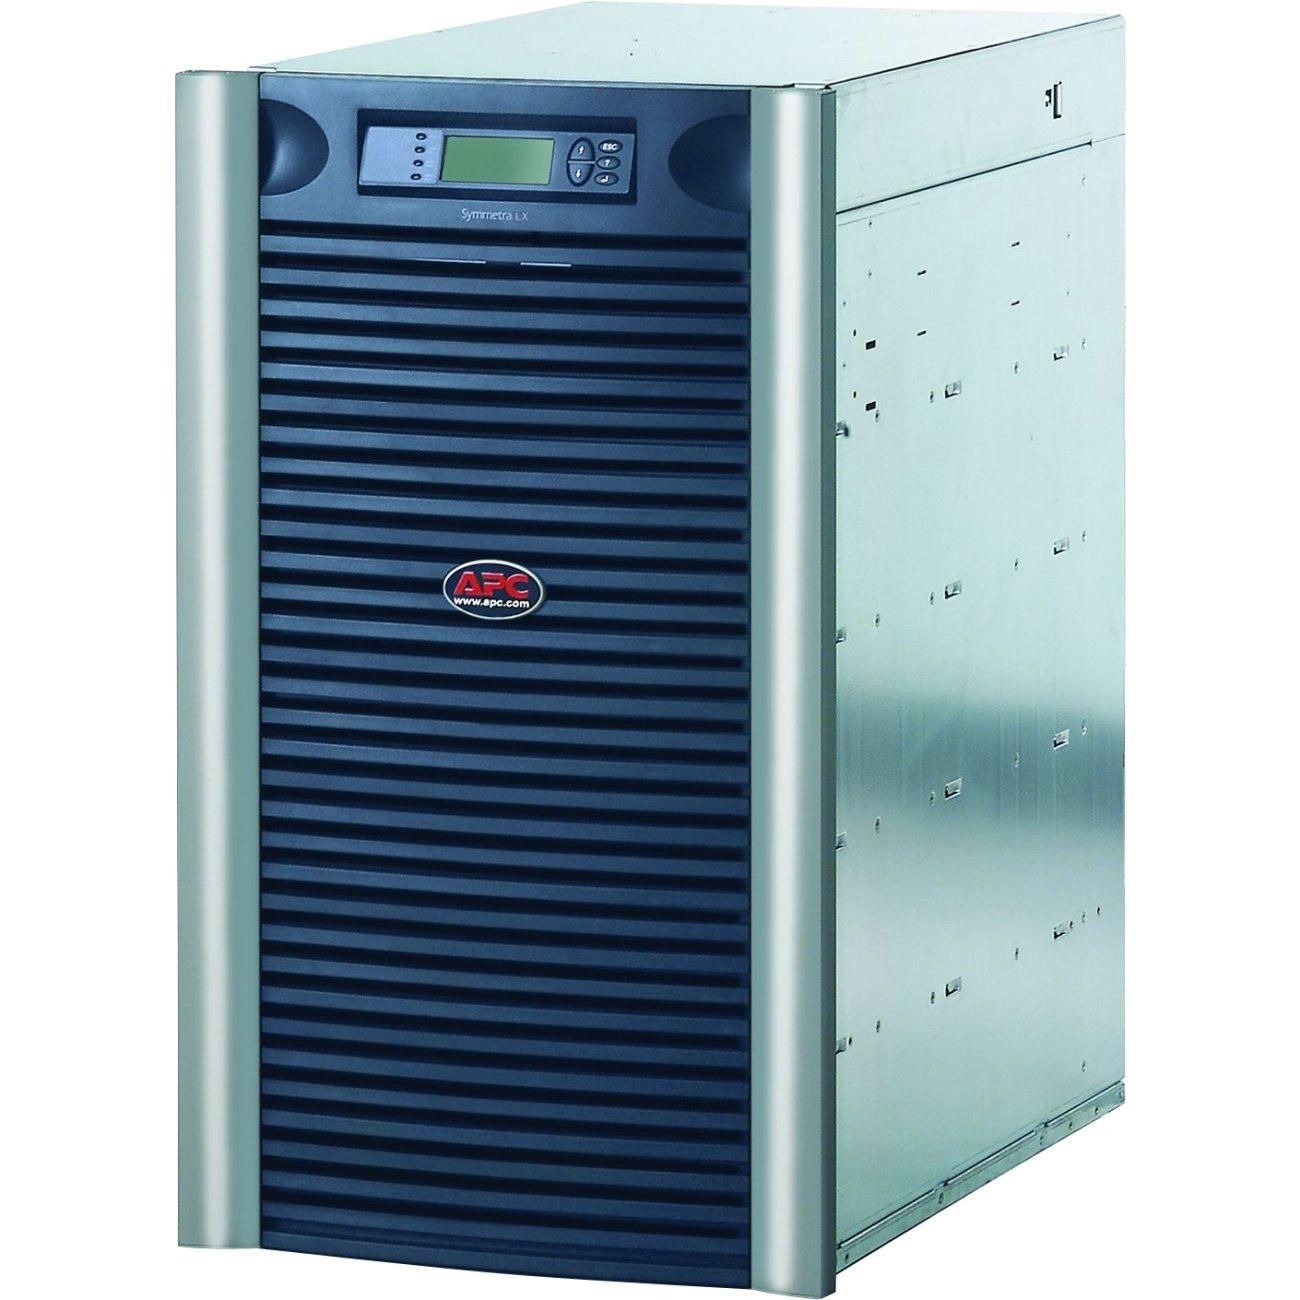 APC by Schneider Electric Symmetra SYA16K16RMI Dual Conversion Online UPS - 16 kVA/11.20 kW